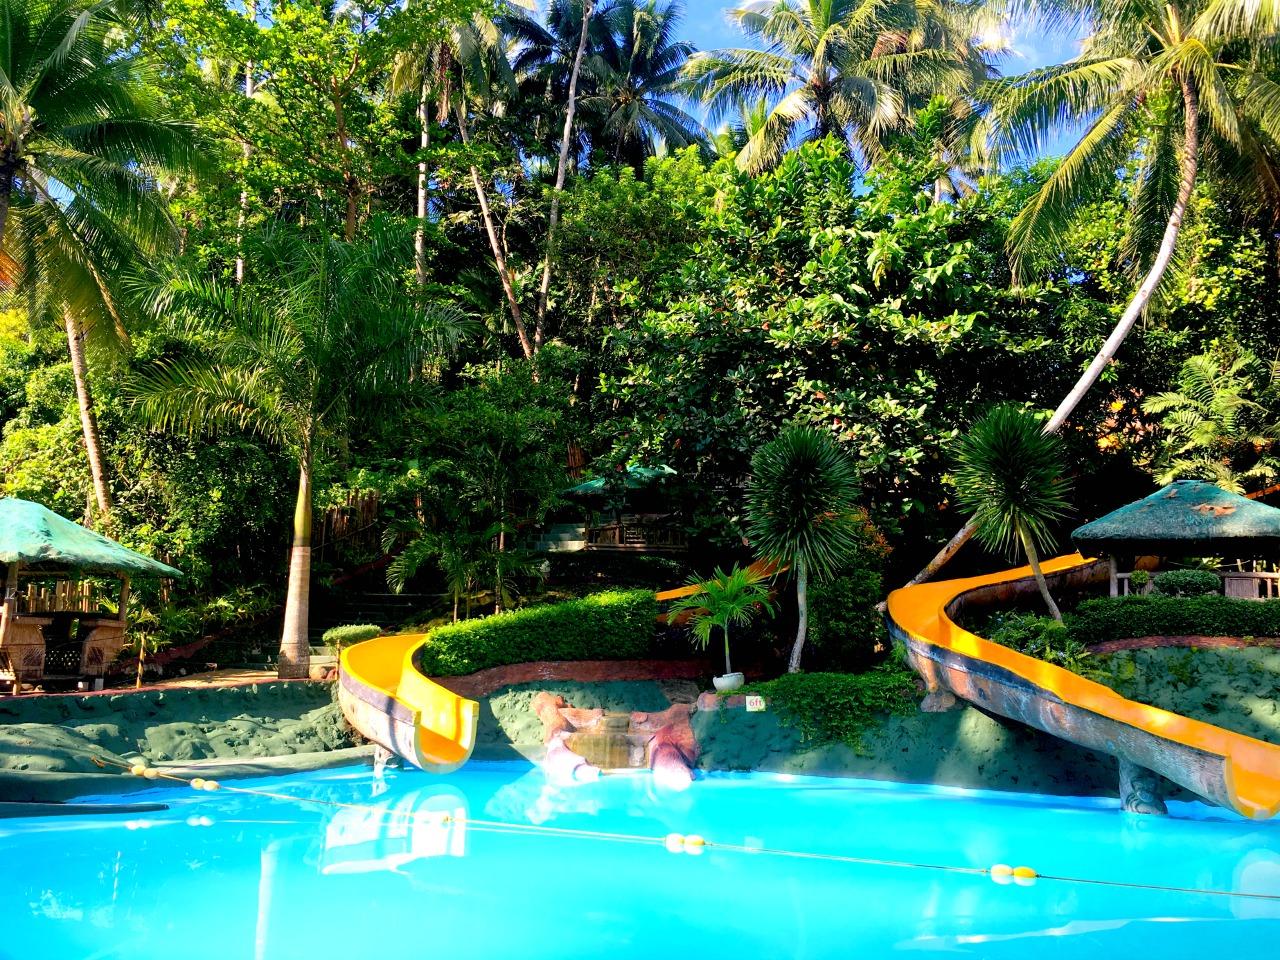 The Easy To Find Gatubod Spring Resort Compostela Cebu